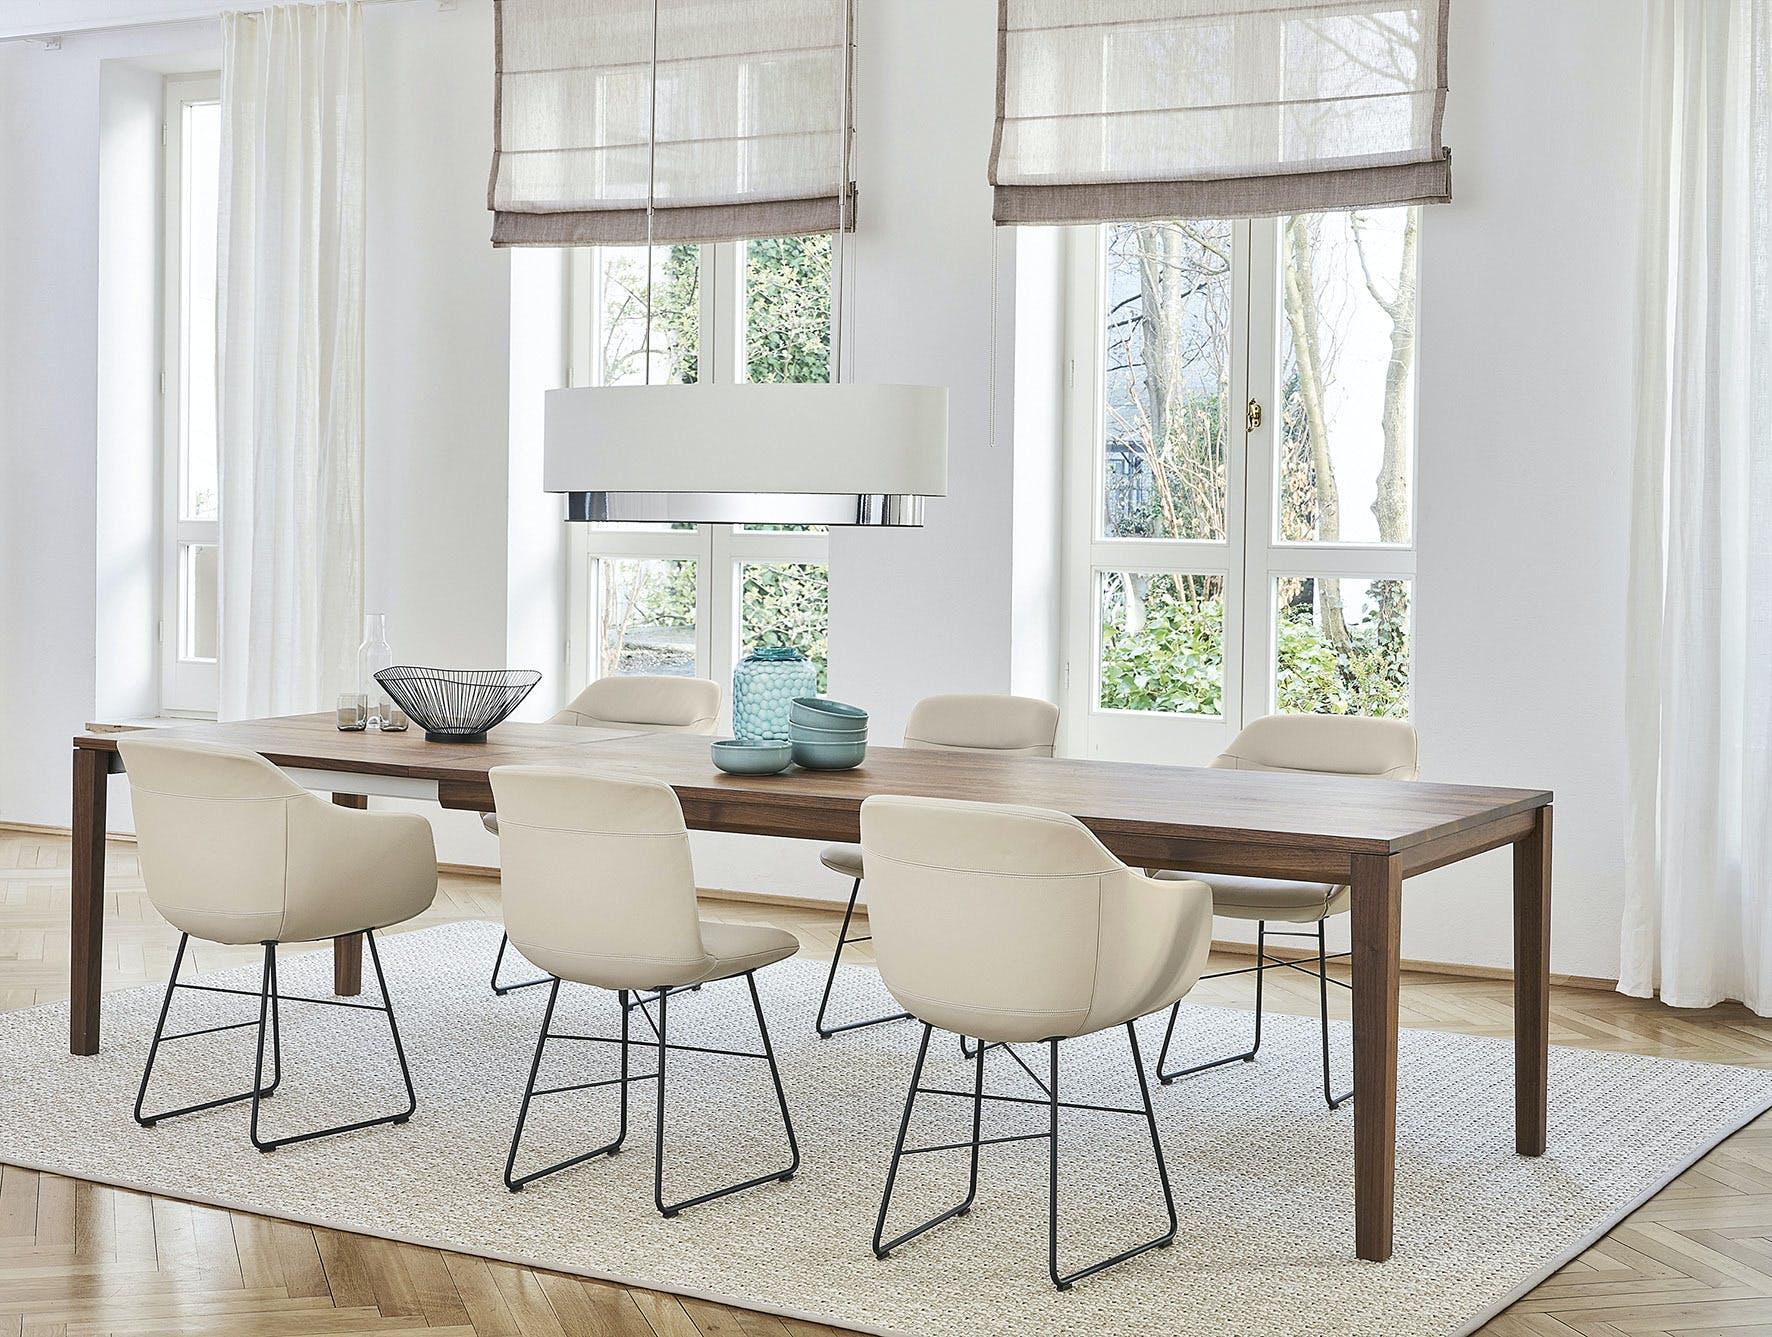 Jab Anstoetz Cara Dining Chair Sled Base Insitu Haute Living